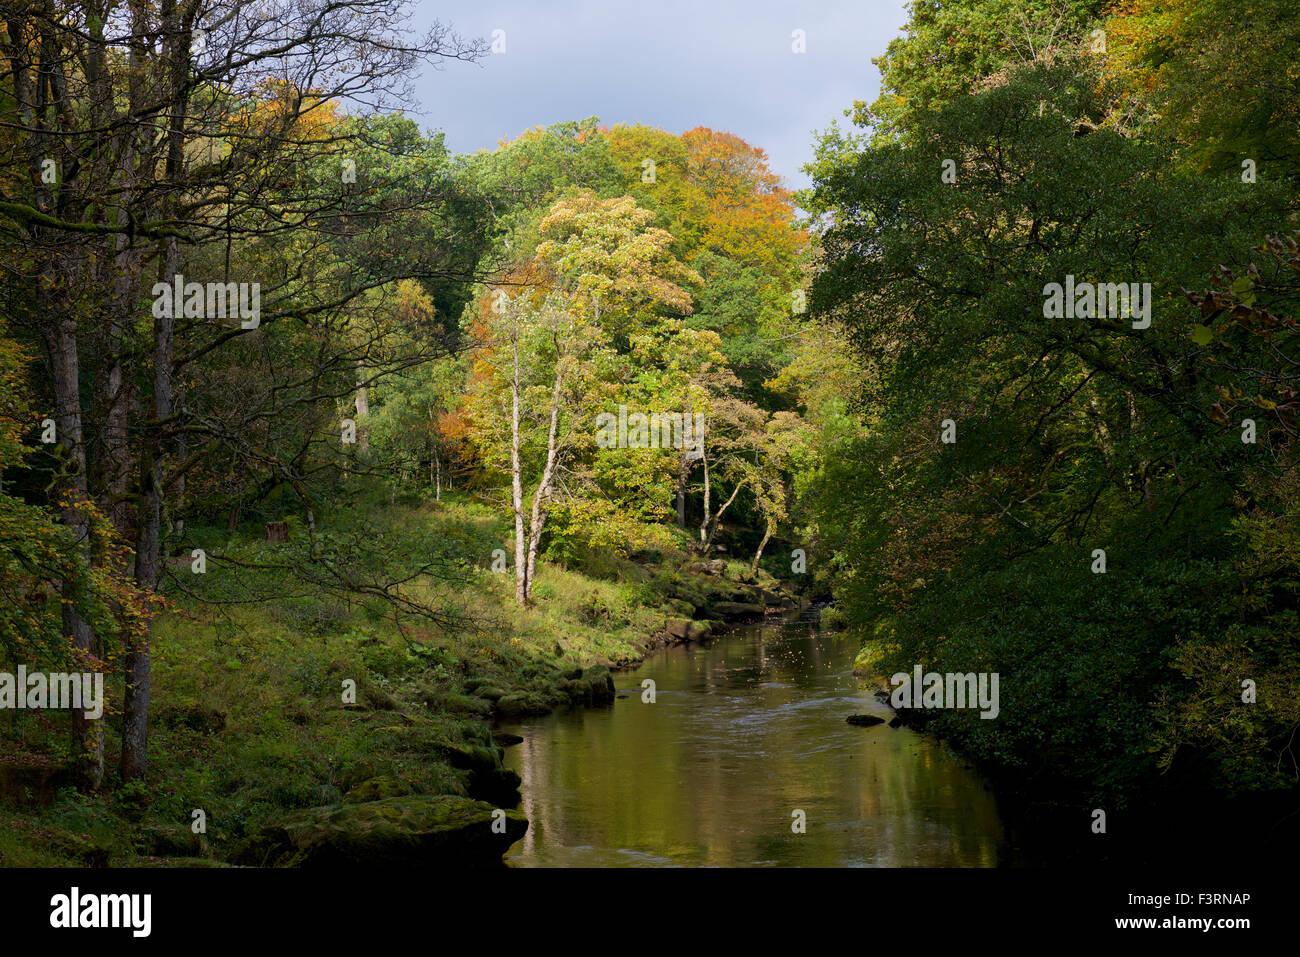 River Wharfe and Bolton Wood, Wharfedale, North Yorkshire, England UK - Stock Image